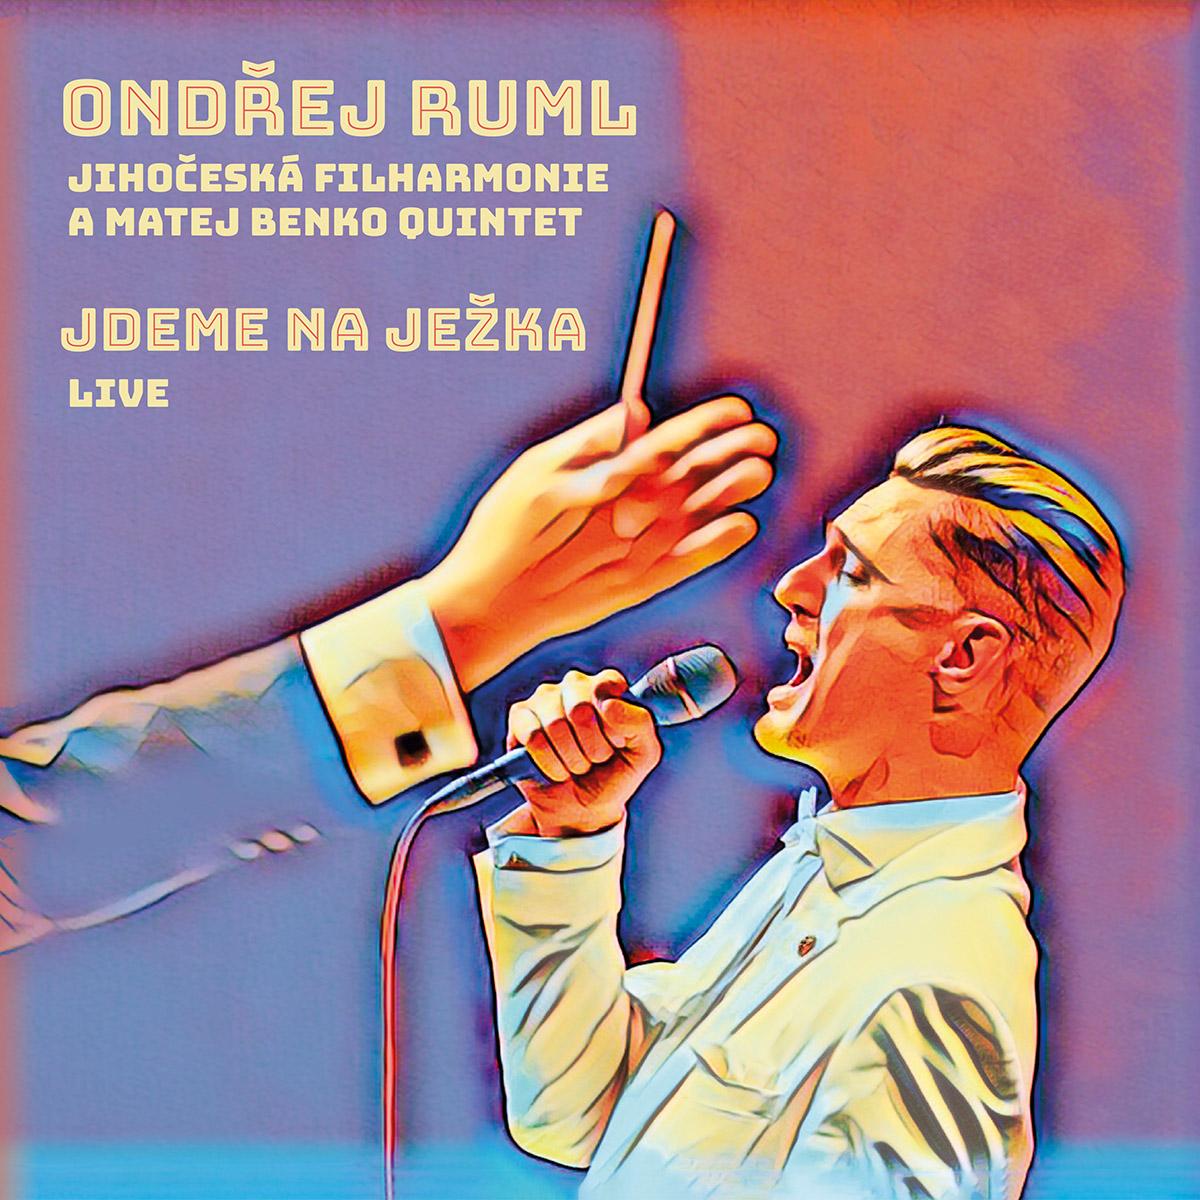 CD Shop - RUML, ONDREJ, JIHOCESKA FILHARMONIE A MATEJ BENKO QUINTET JDEME NA JEZKA (LIVE)